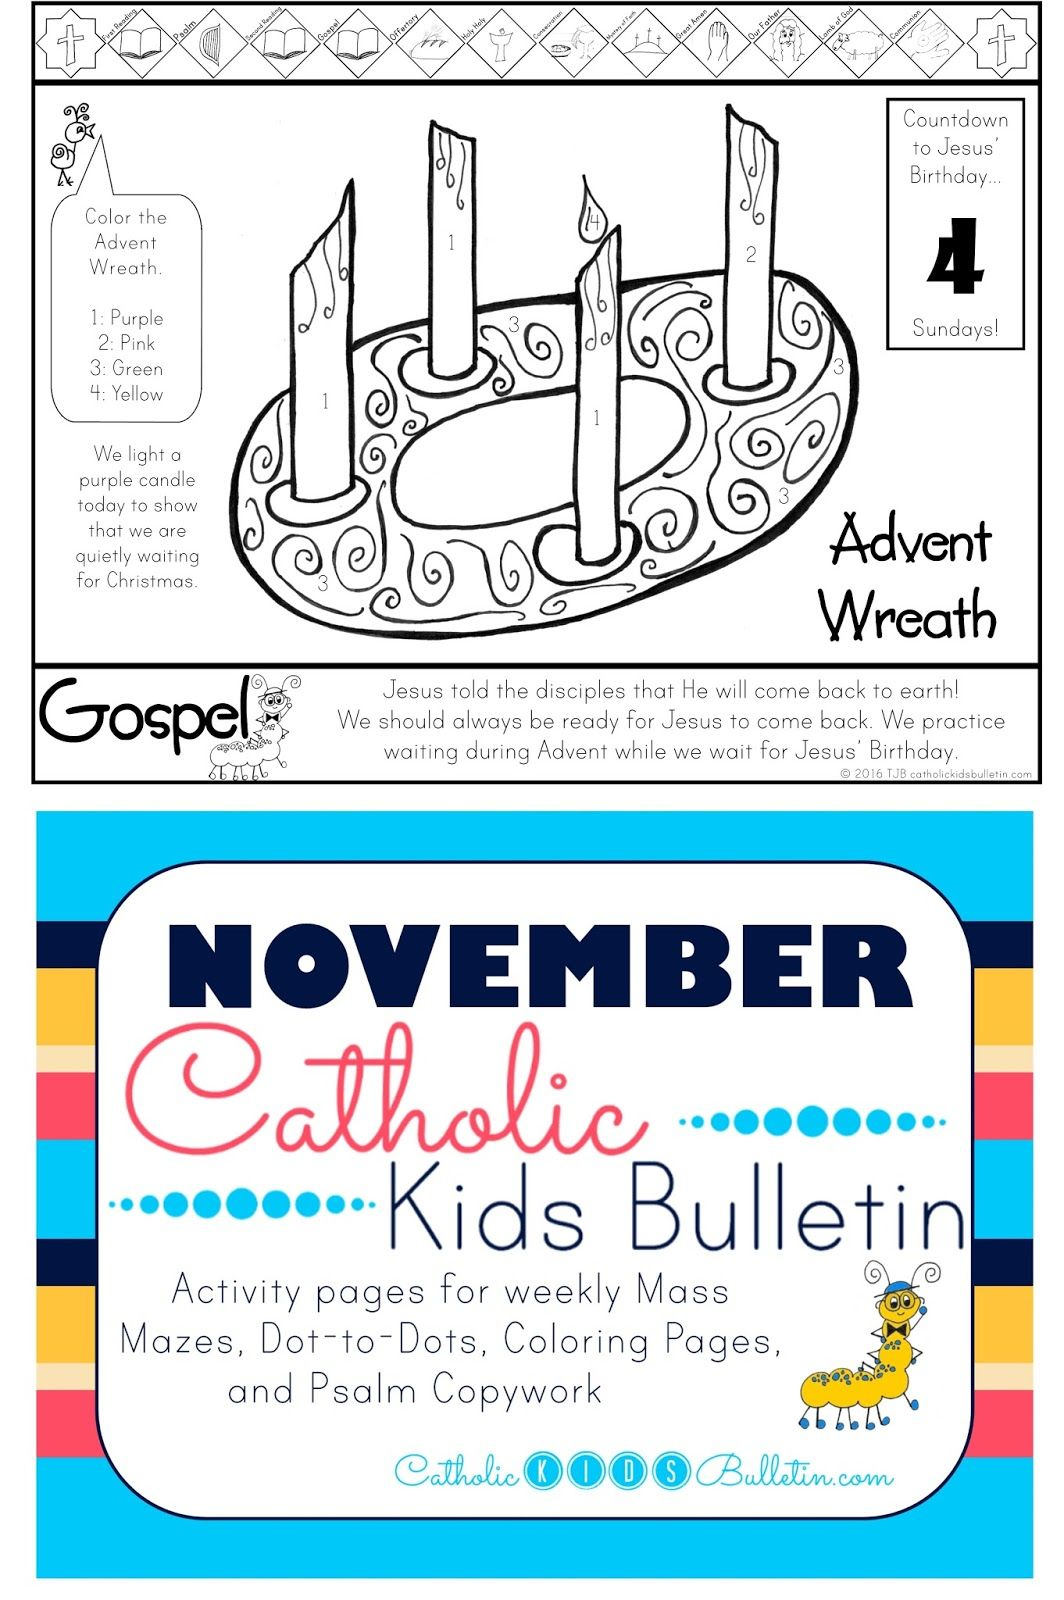 Catholic Kids Bulletin Weekly Mass Prep for Kids Matthew 24 37